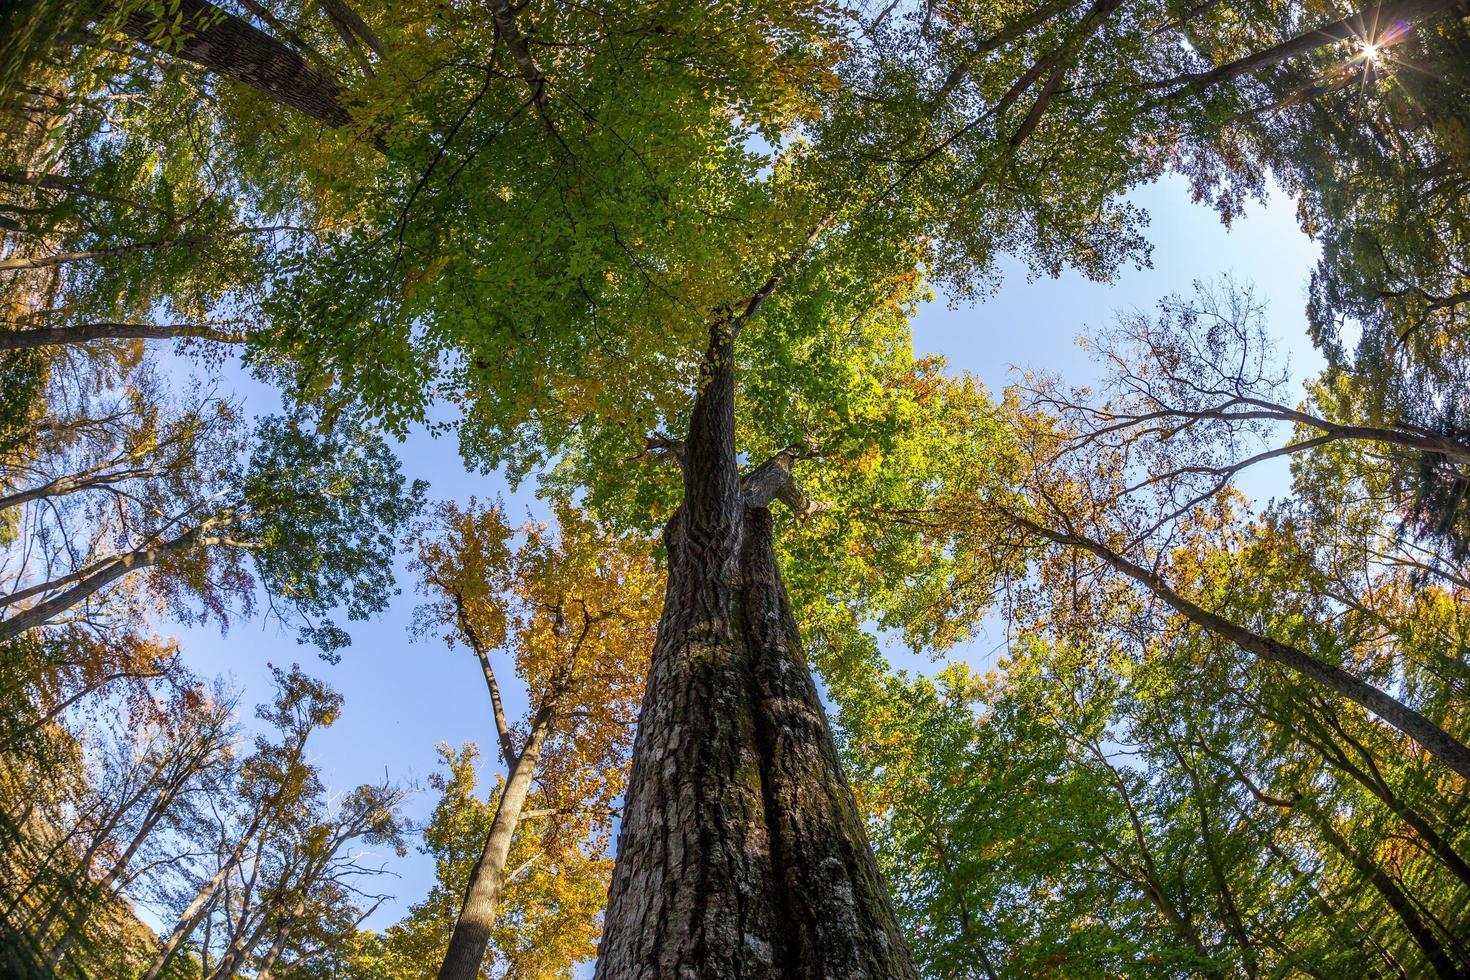 regardant de grands arbres d'automne photo